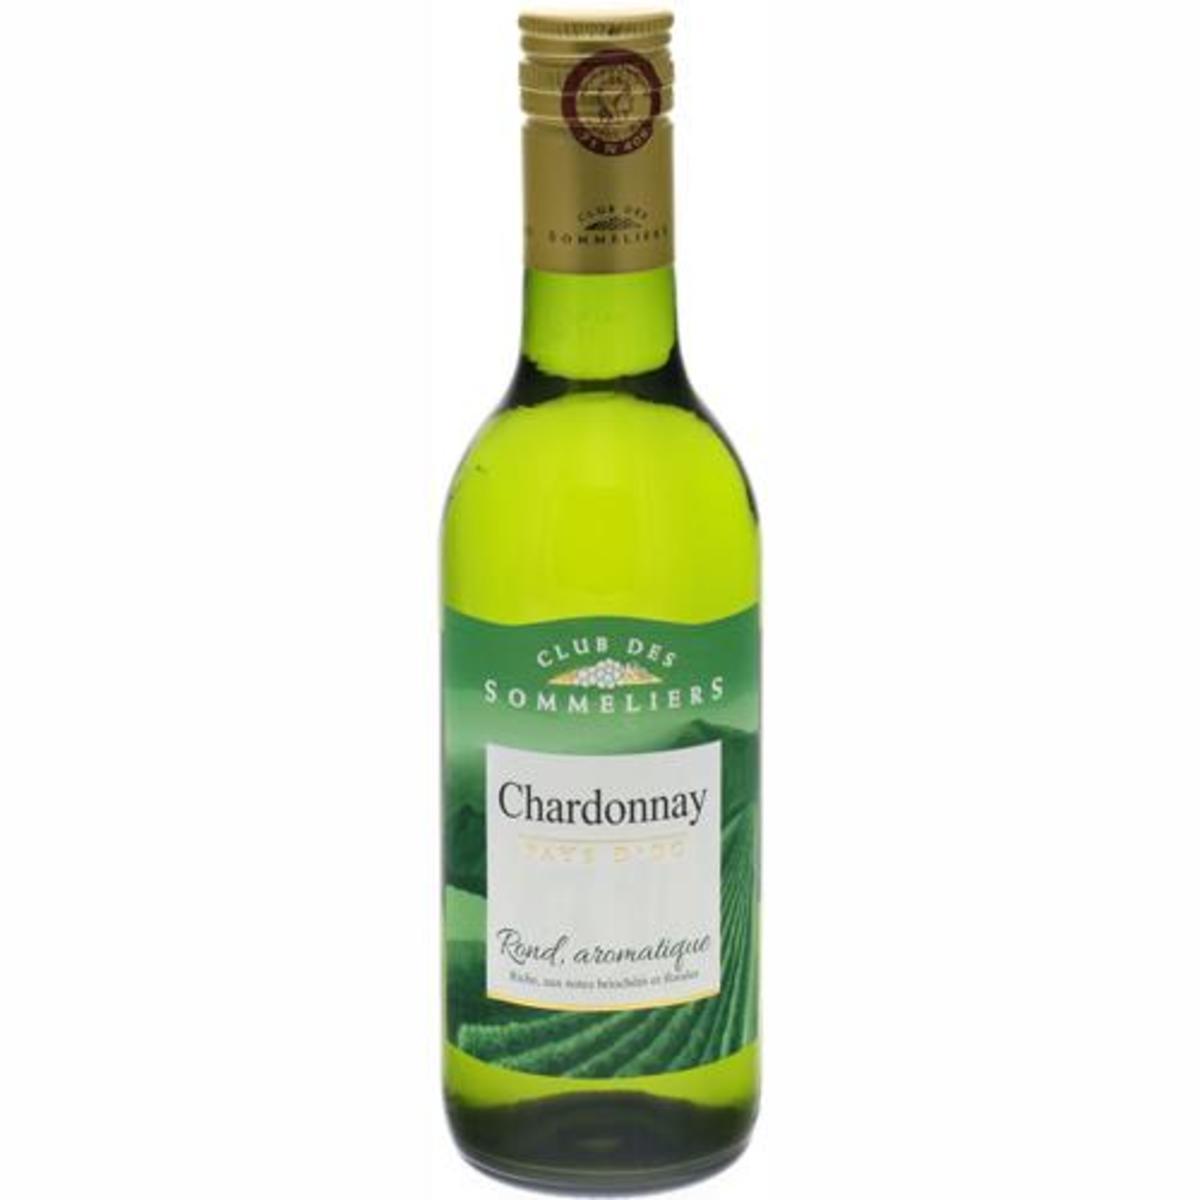 法國直送 - Pays d'Oc Chardonnay White Wine IGP Club Des Sommeliers (250ml)